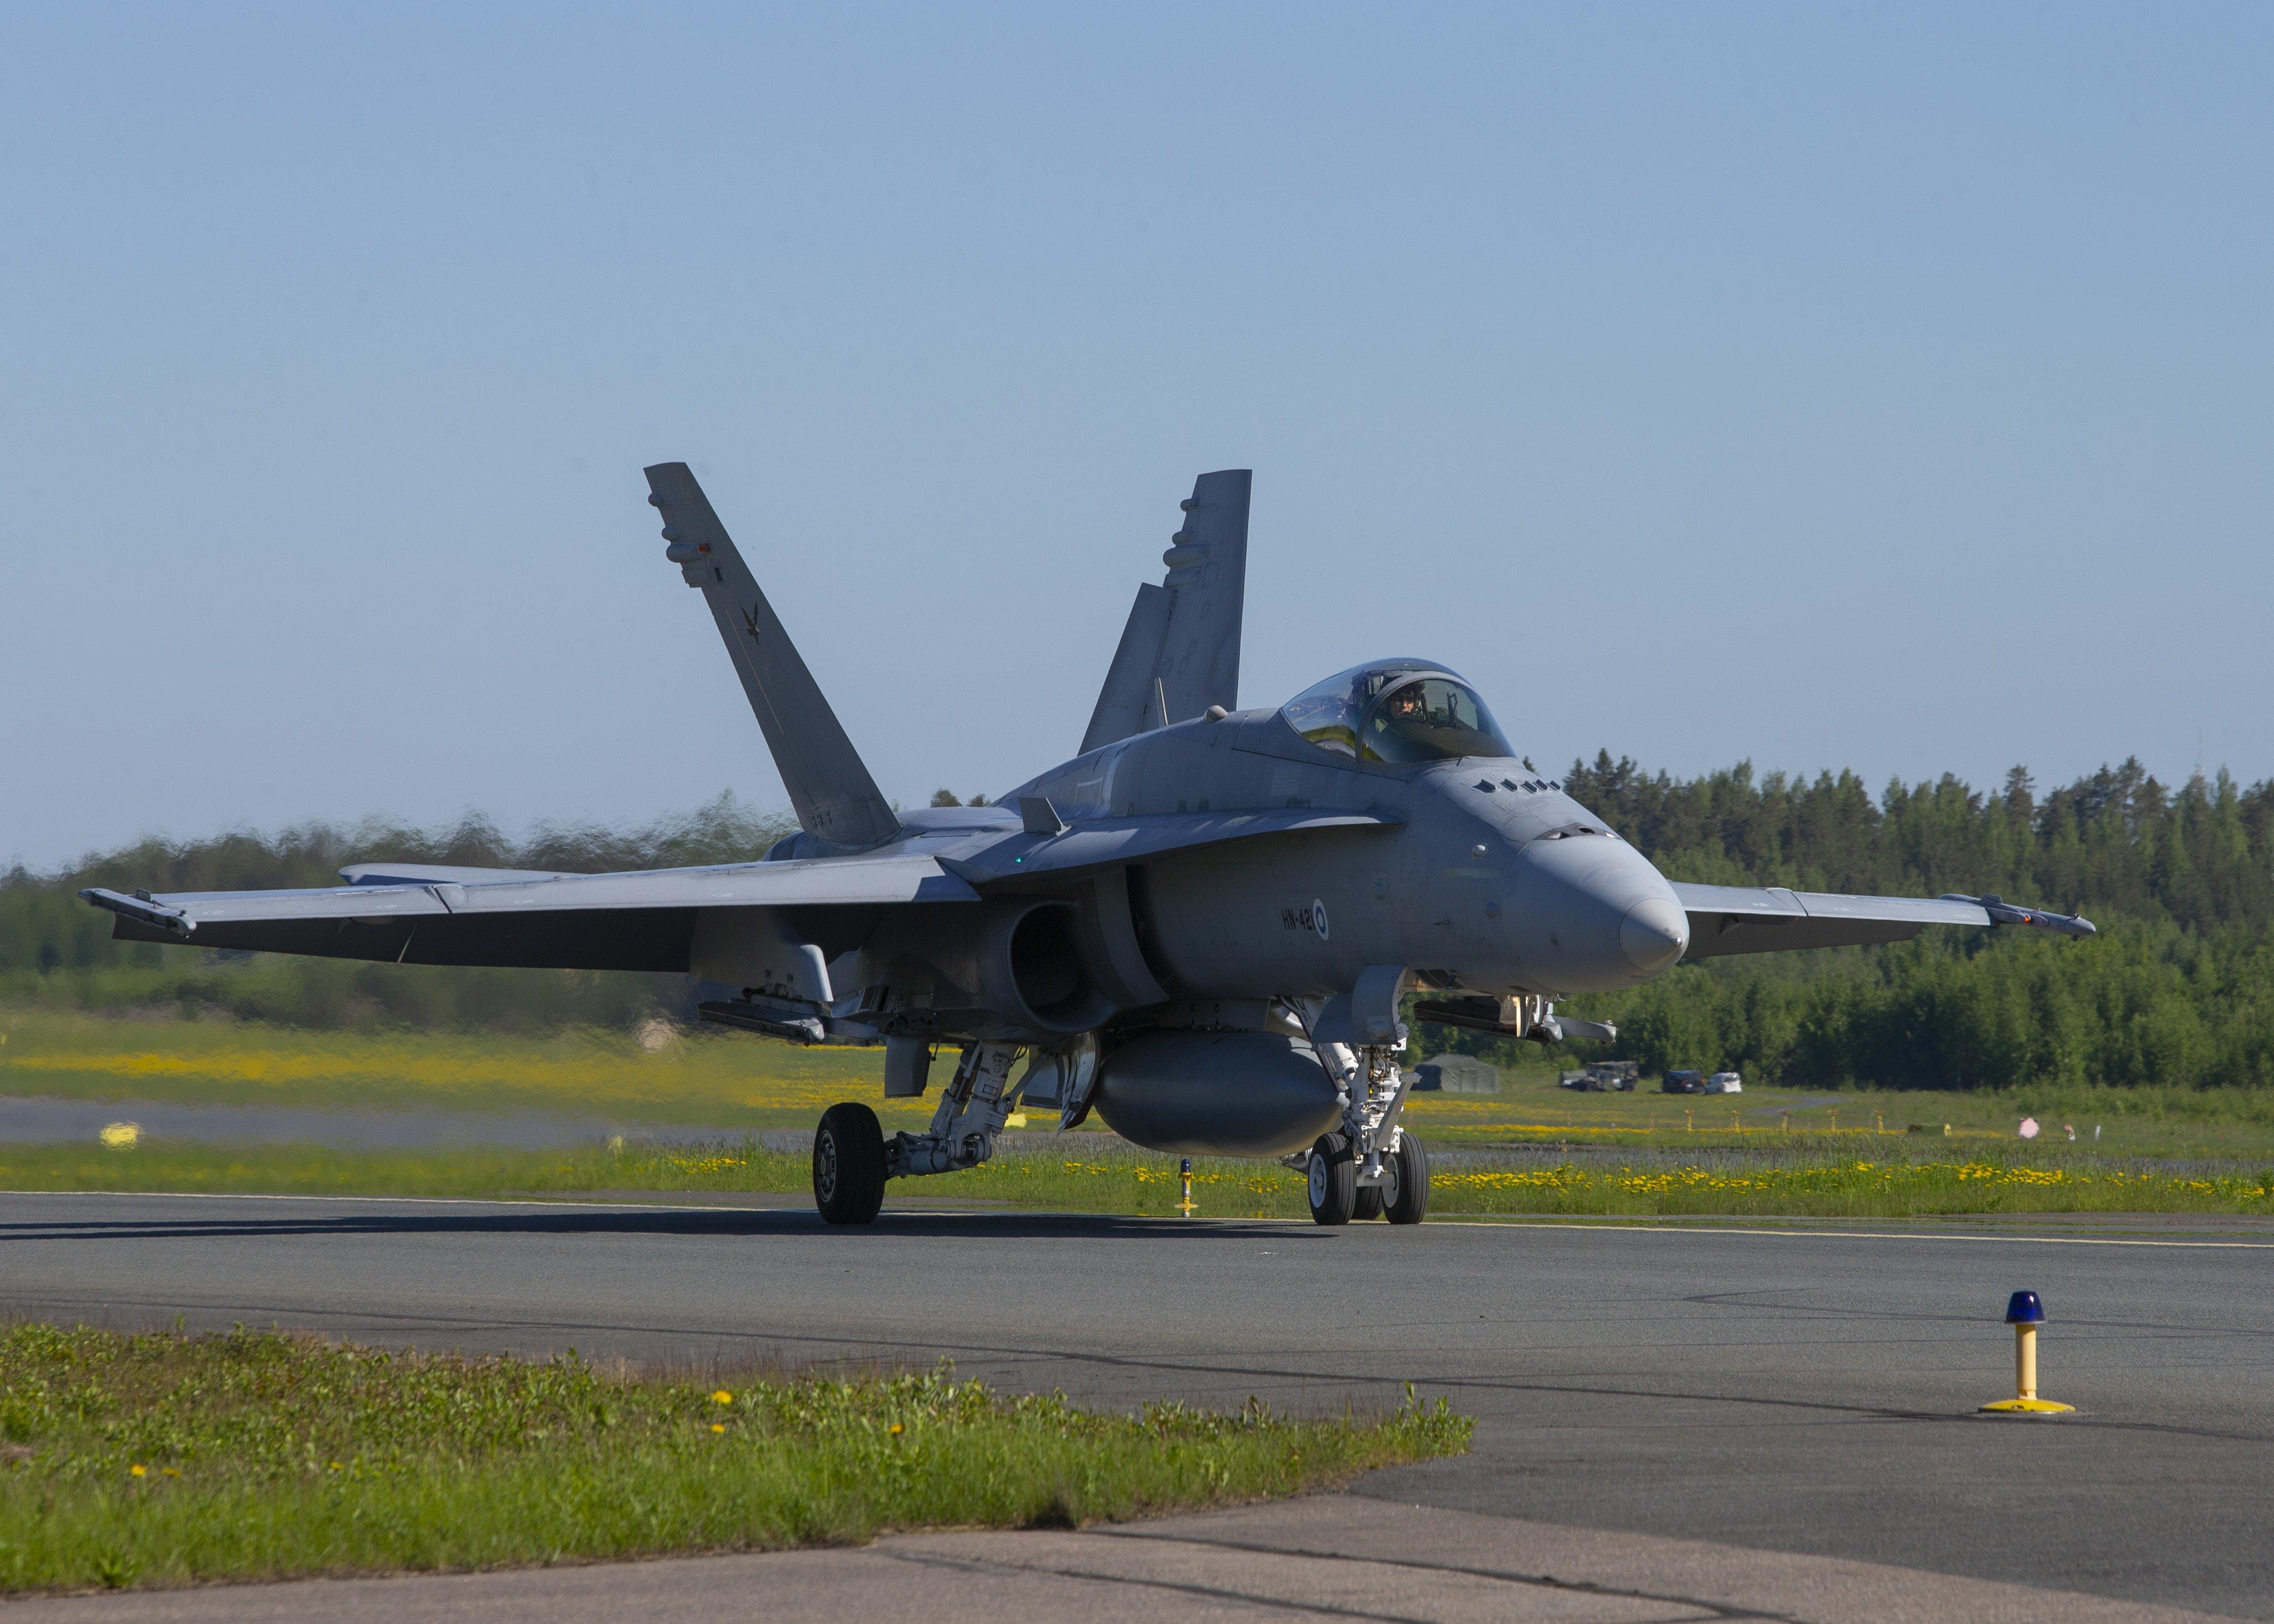 Finnish AF F/A-18C Hornet preps for take-off at Rissala [USMC/Lance Cpl Caleb Stelter]